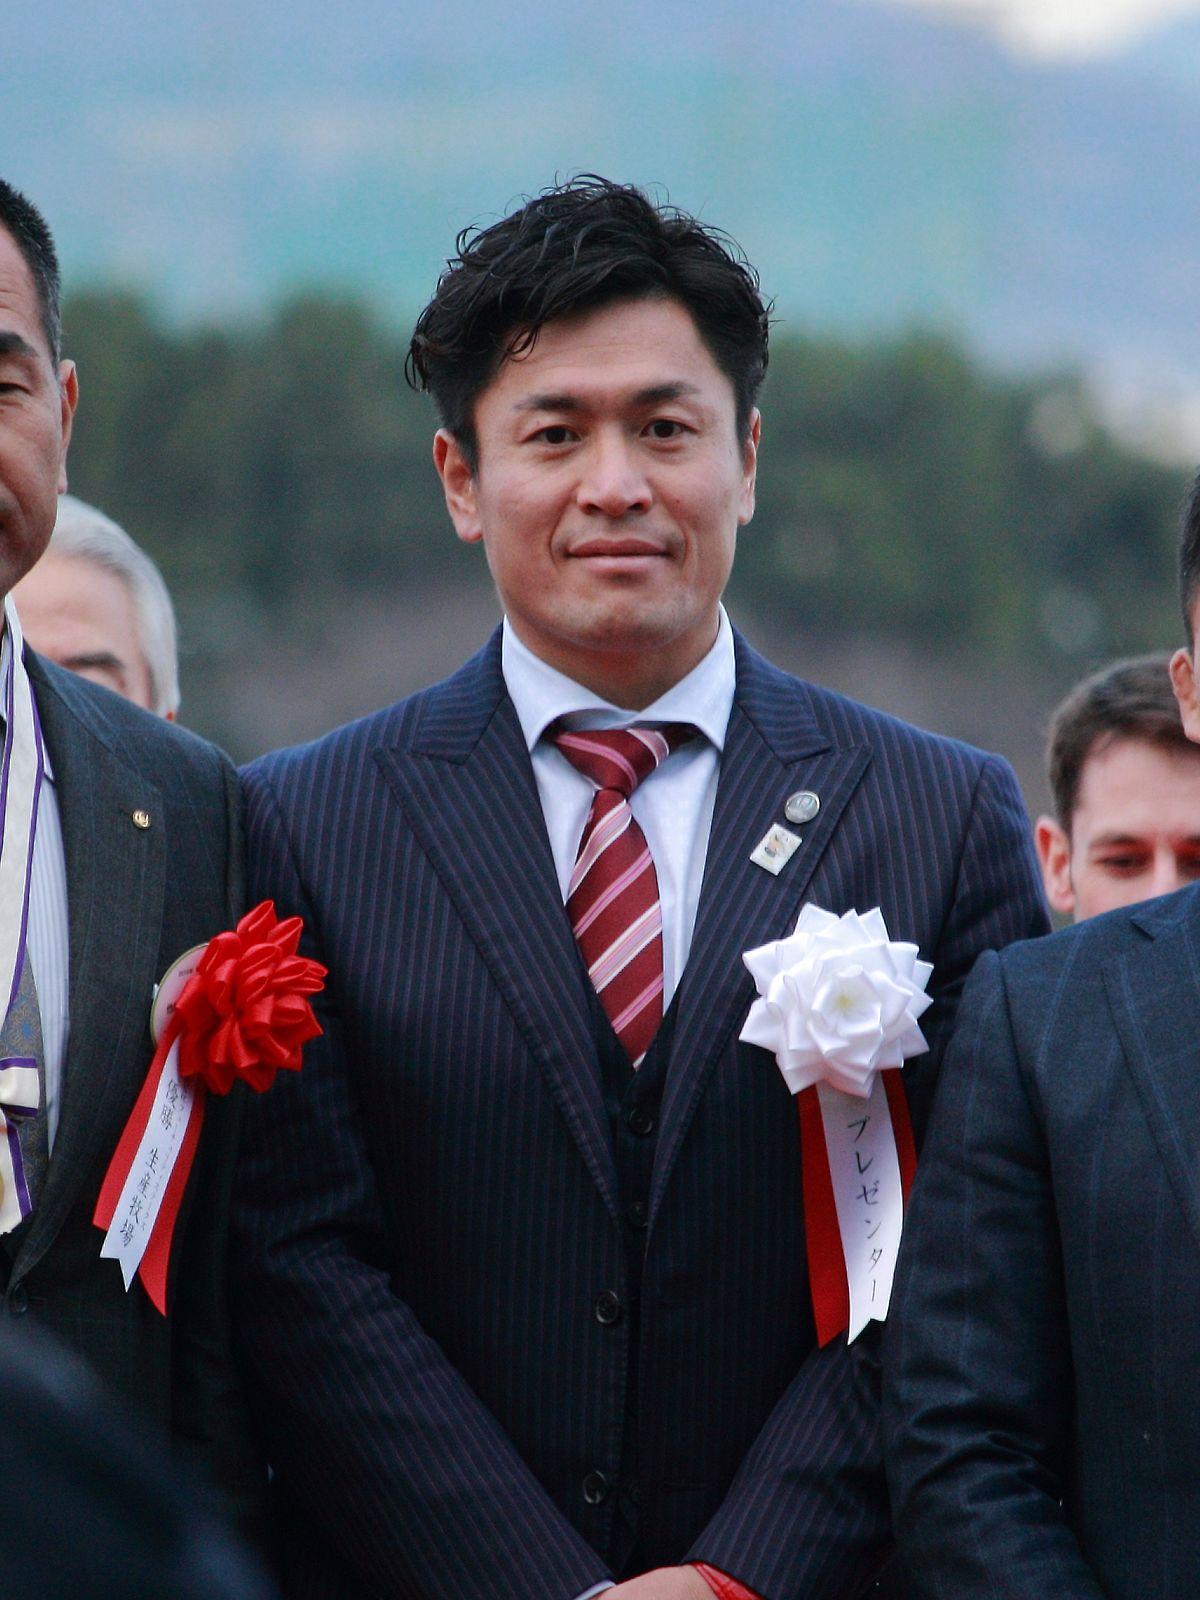 Daisuke Ohata Daisuke Ohata Wikipedia